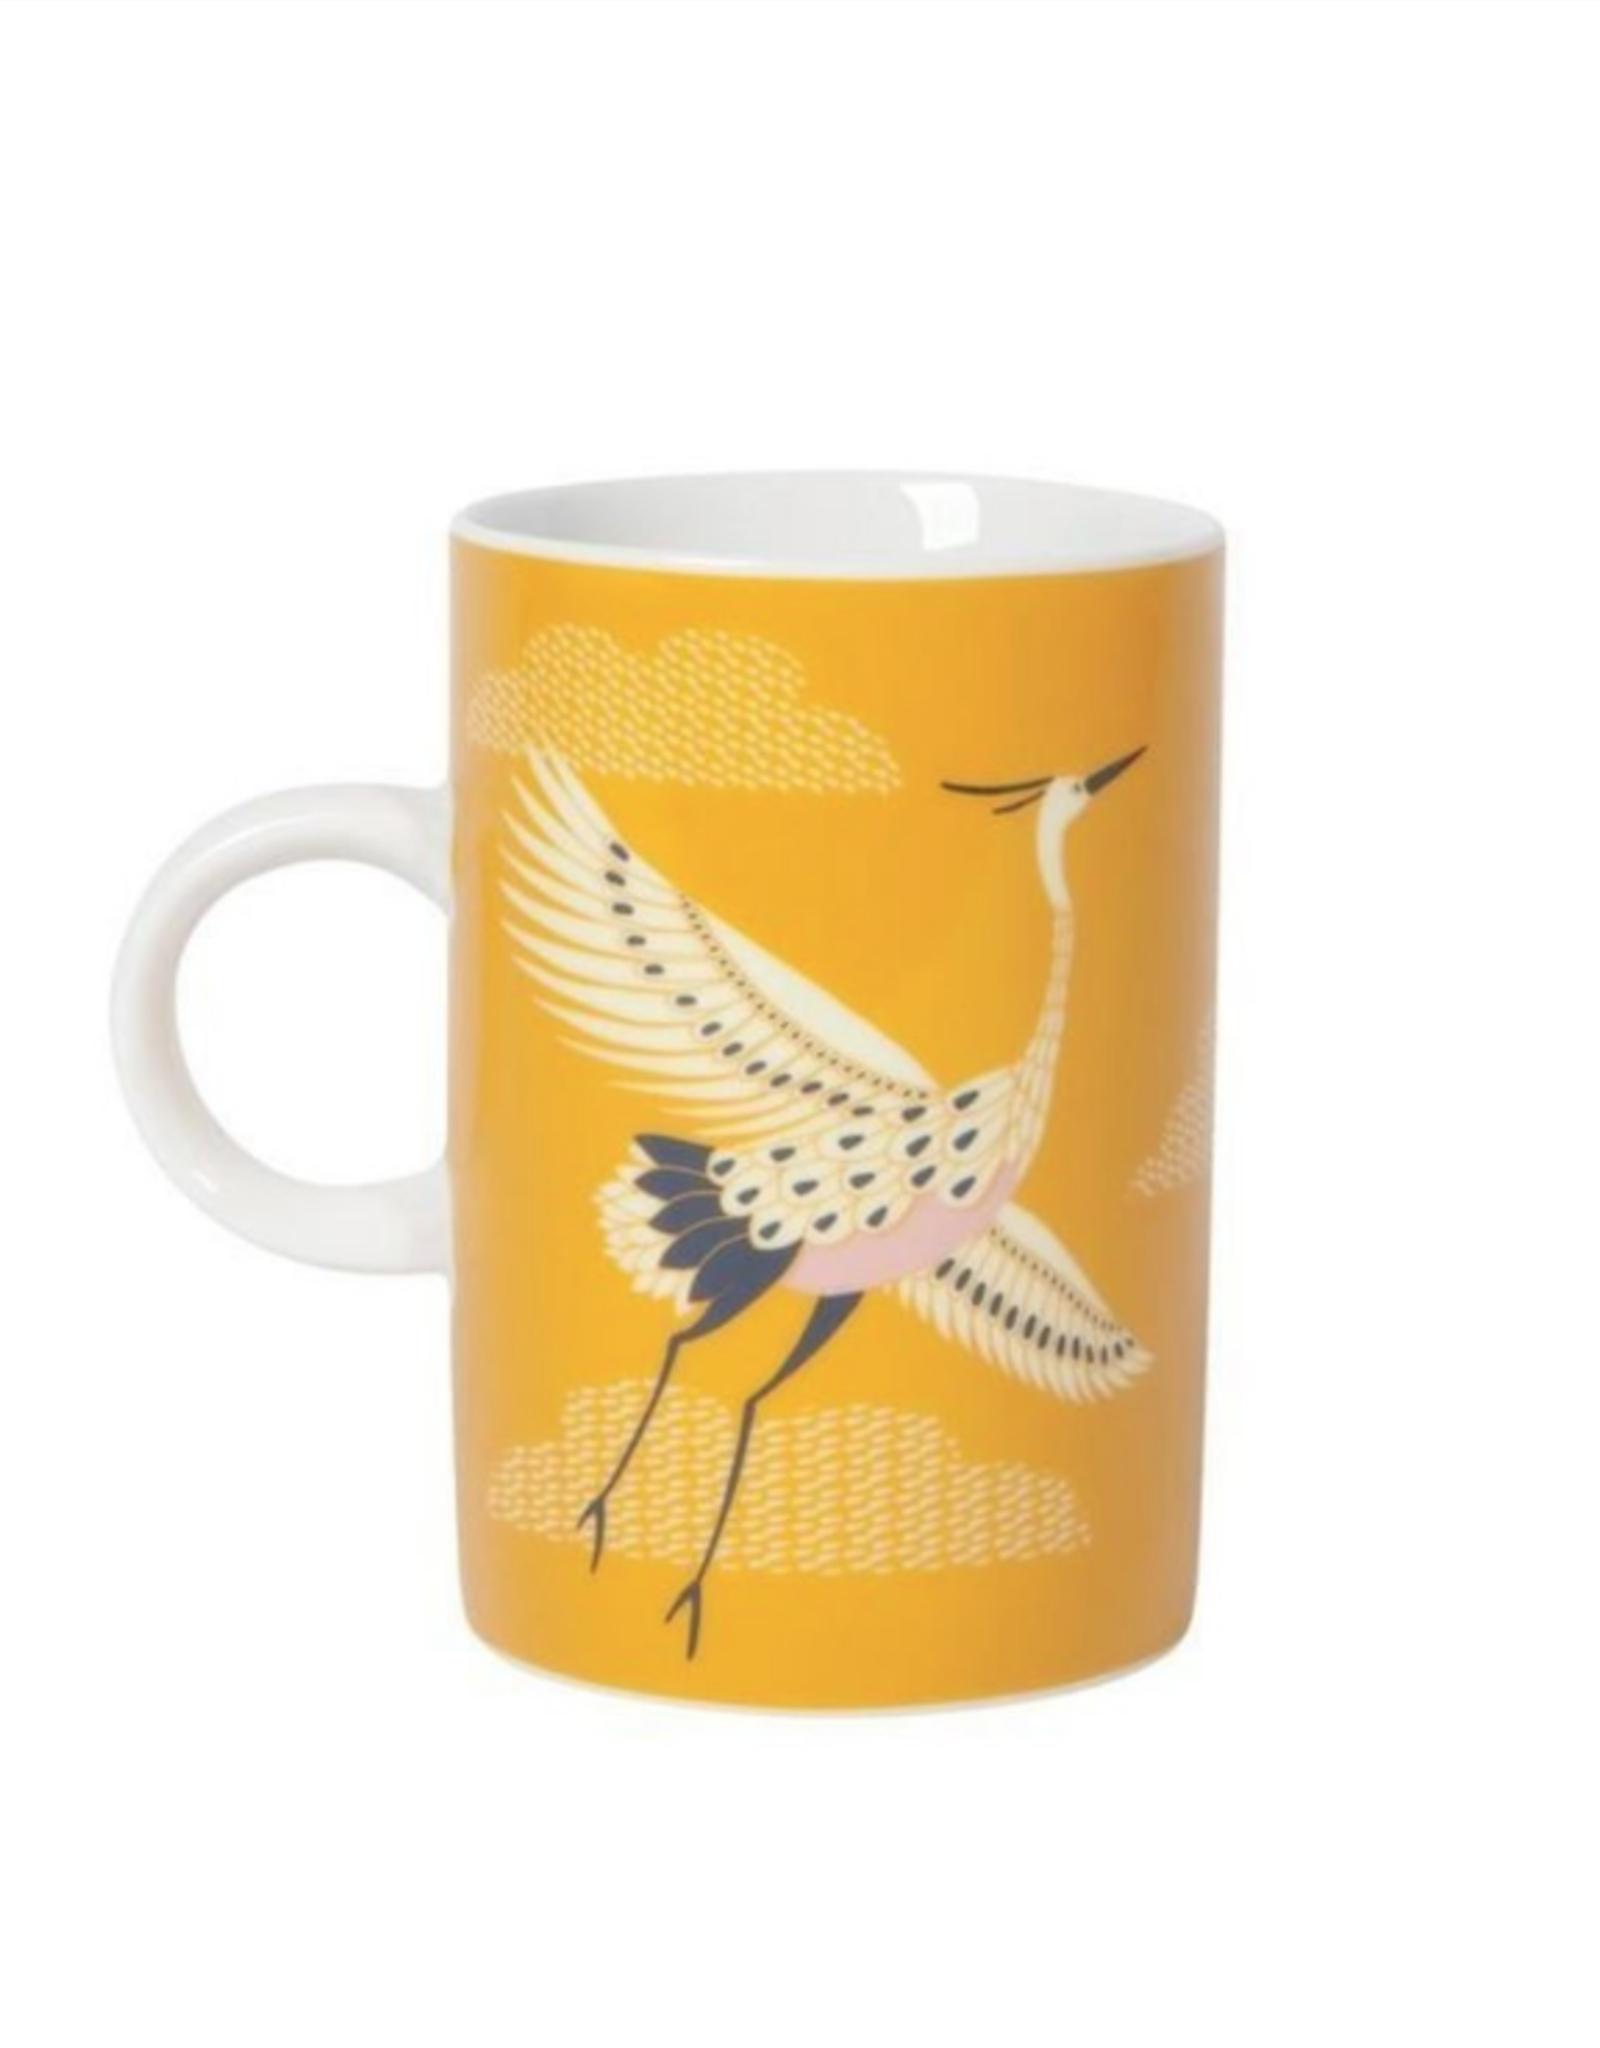 Danica Danica - Mug Flight of Fancy